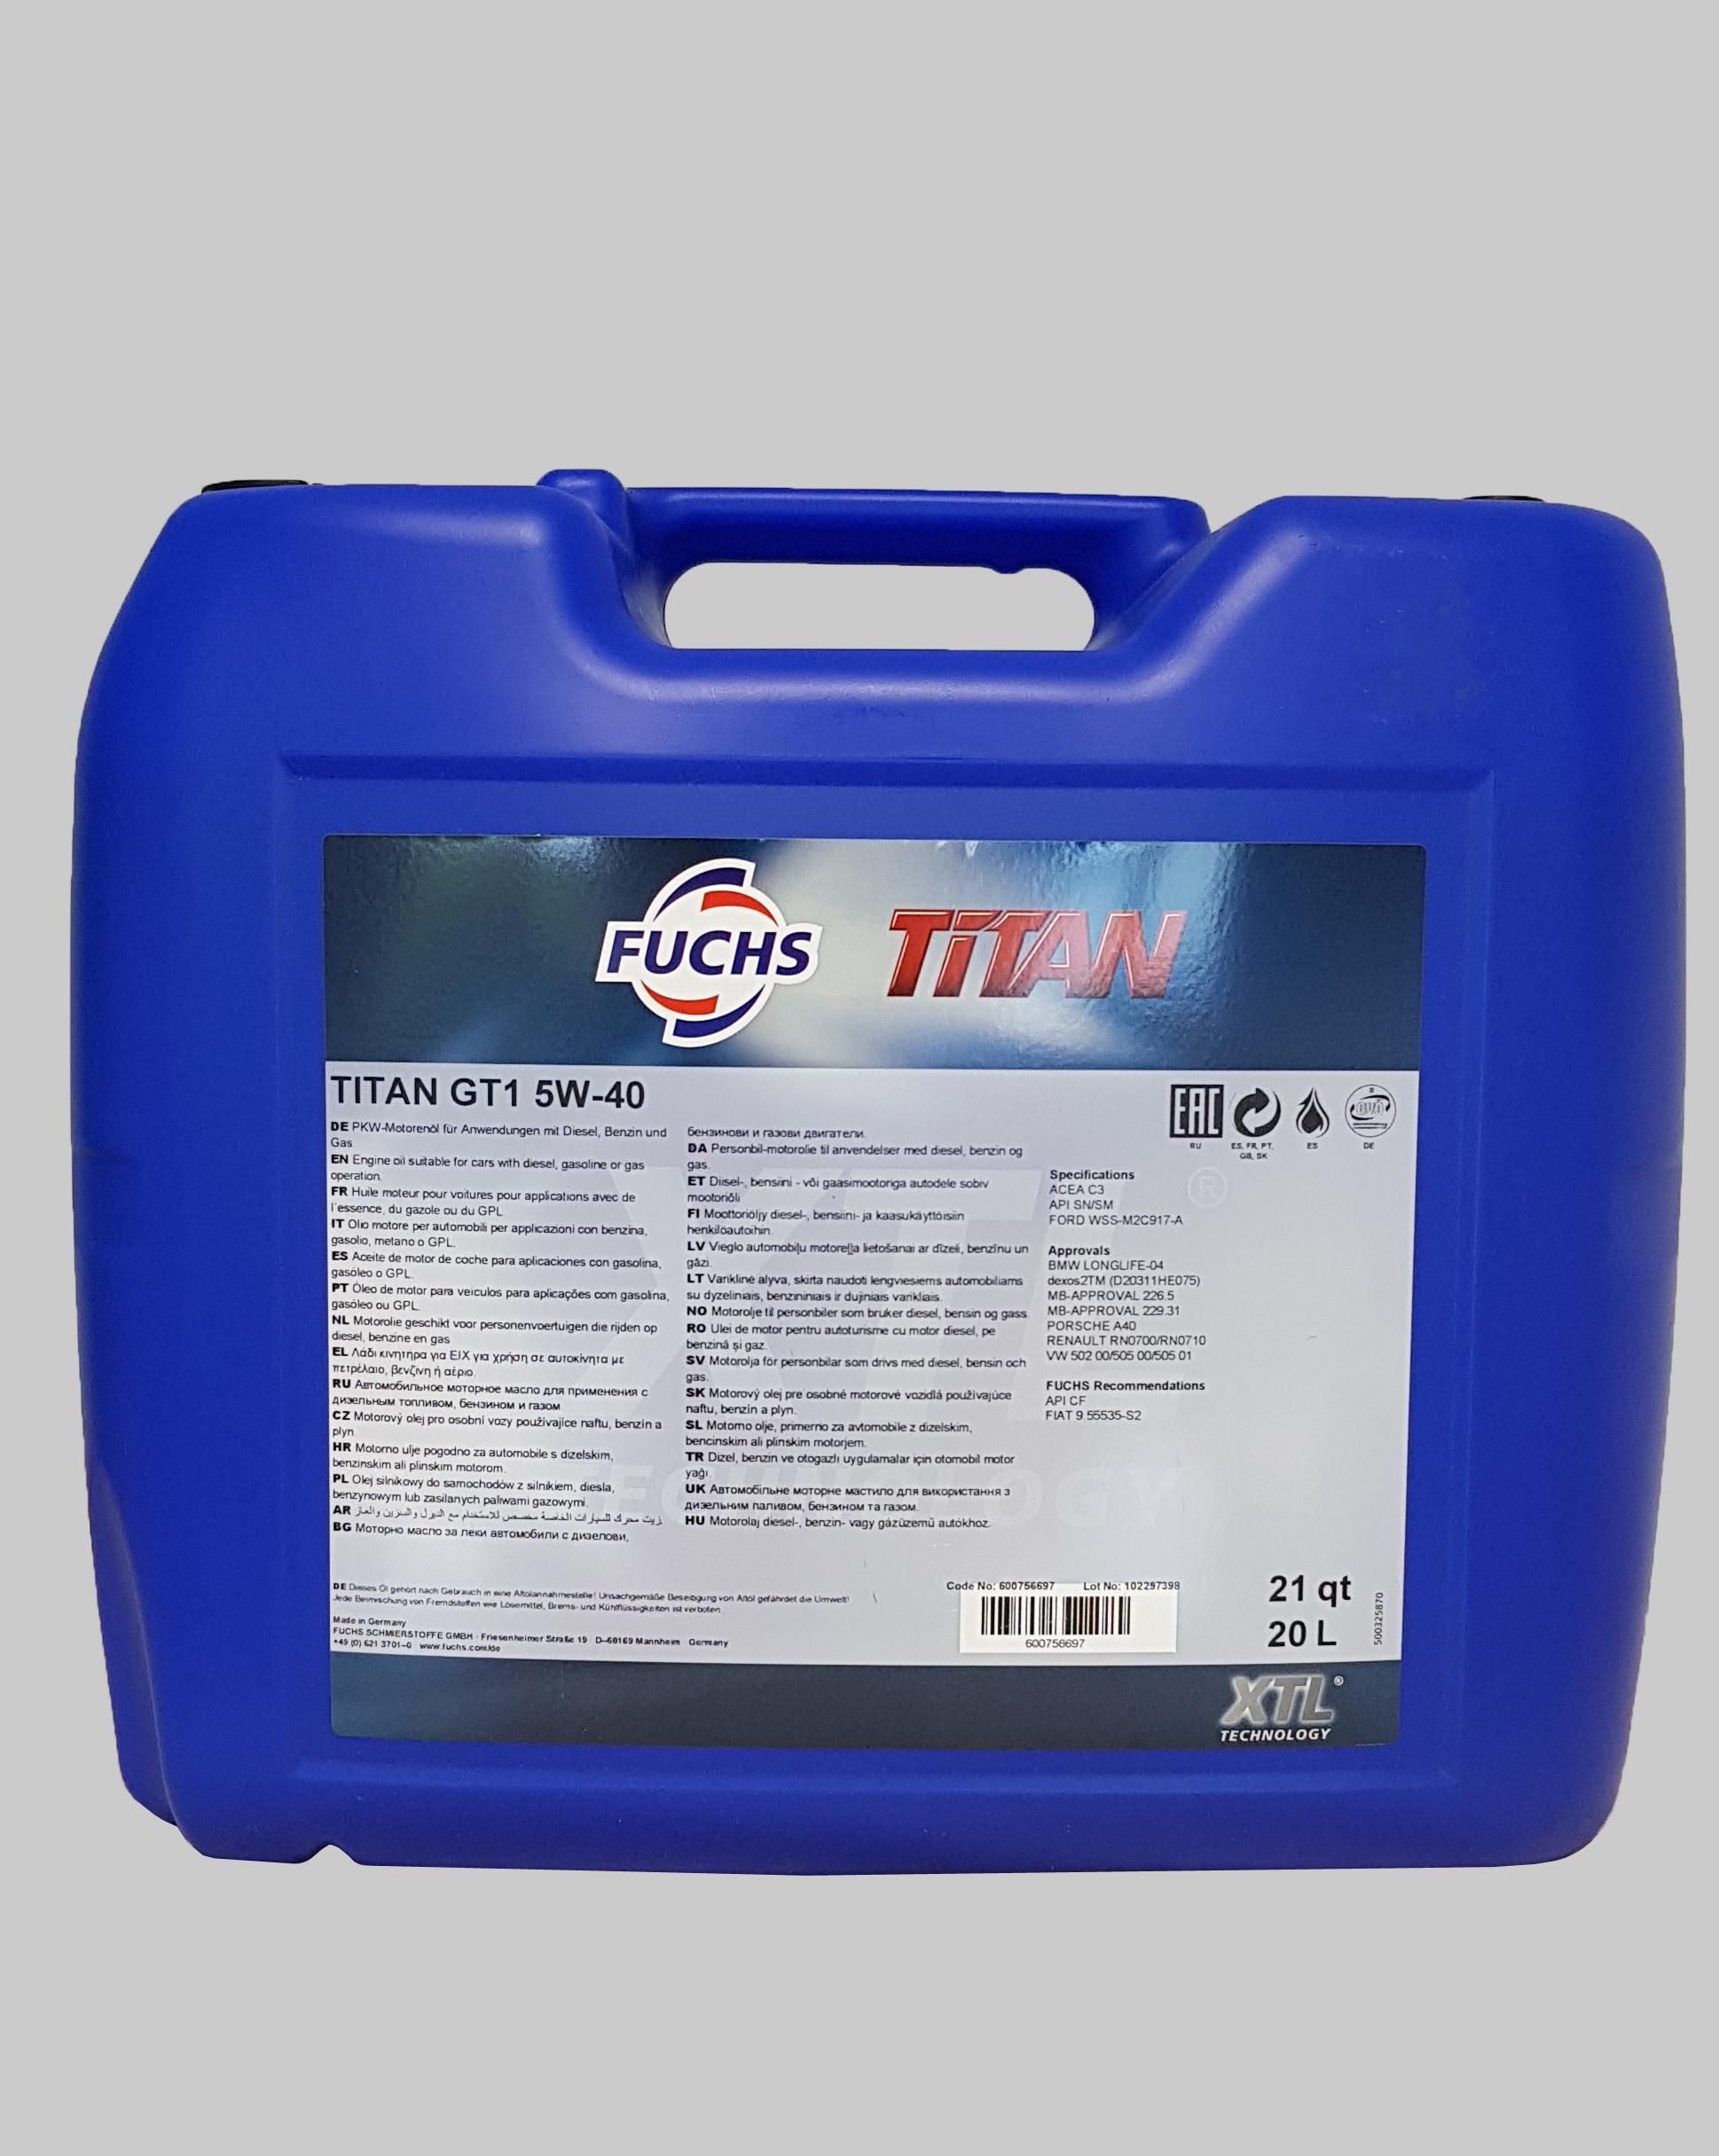 Fuchs Titan GT1 5W-40 20 Liter